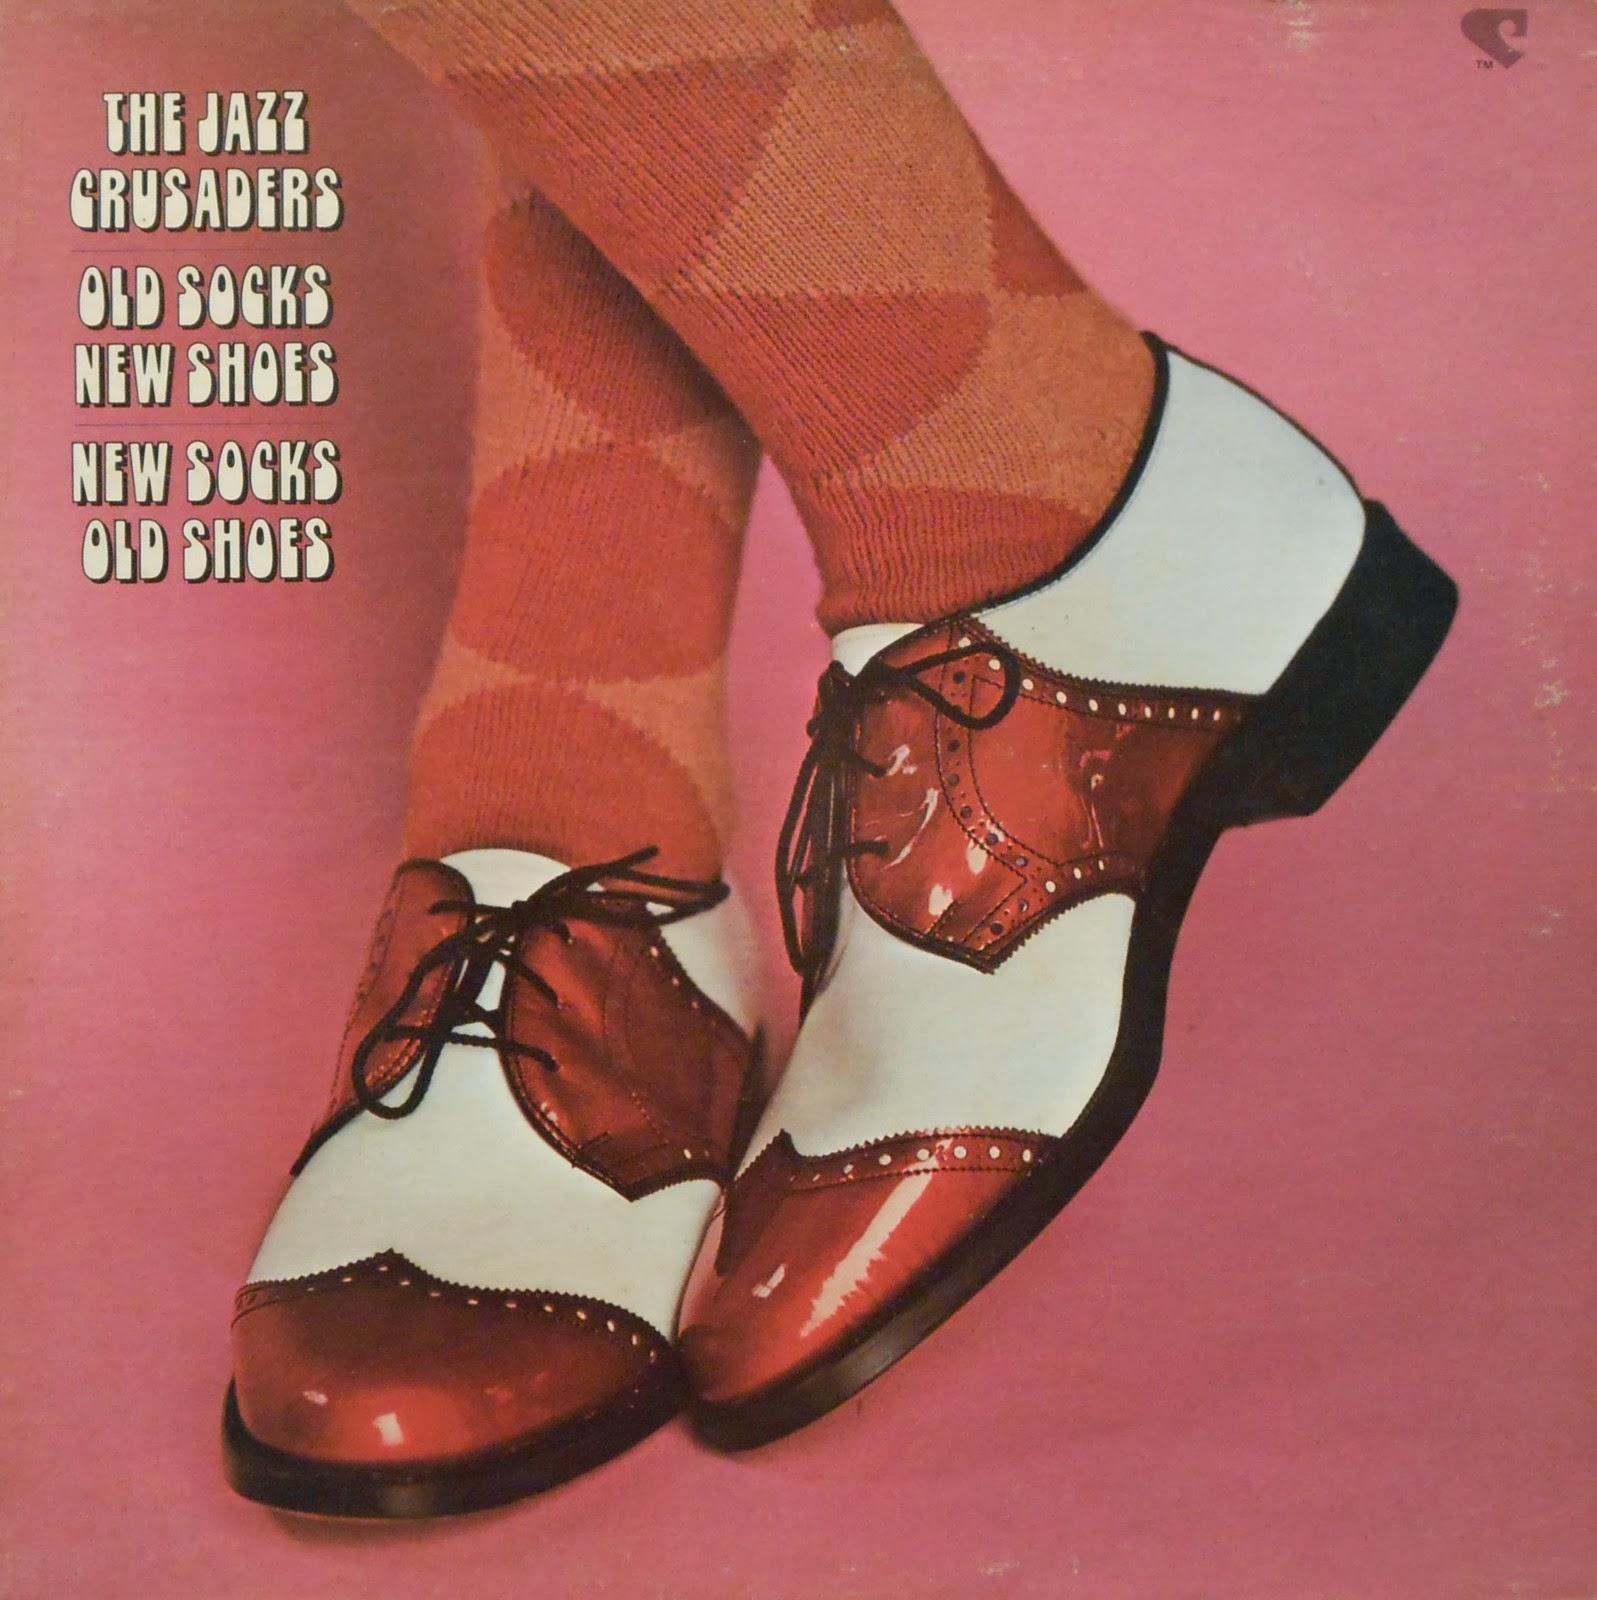 Jazz Crusaders Old Socks New Shoes Blogspot